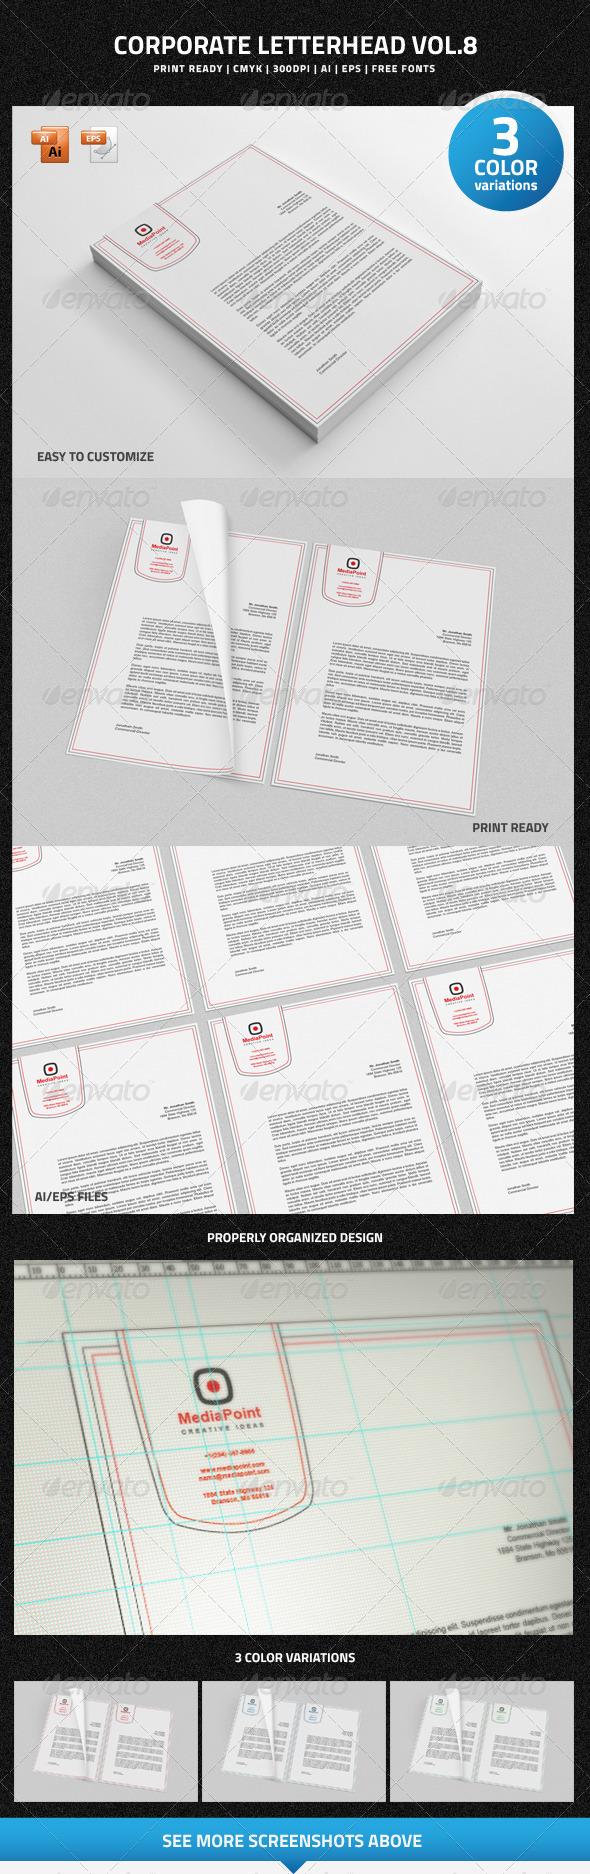 Corporate Letterhead vol.8 - Stationery Print Templates